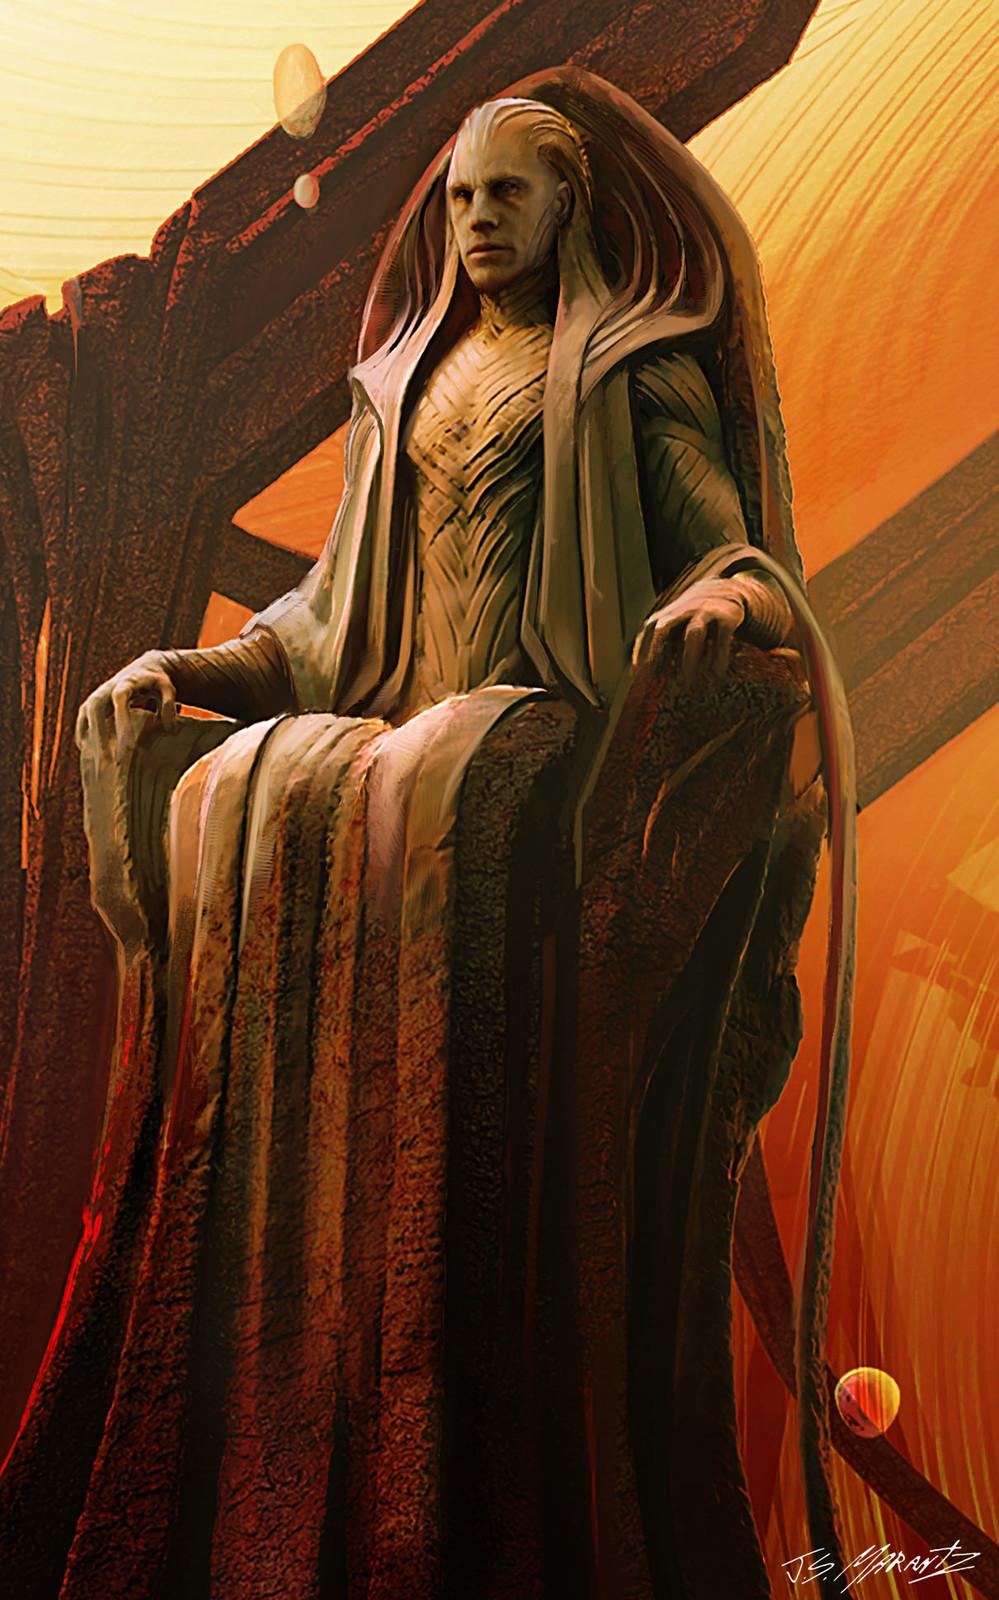 Guardians of the Galaxy vol2: Ego Concept Art